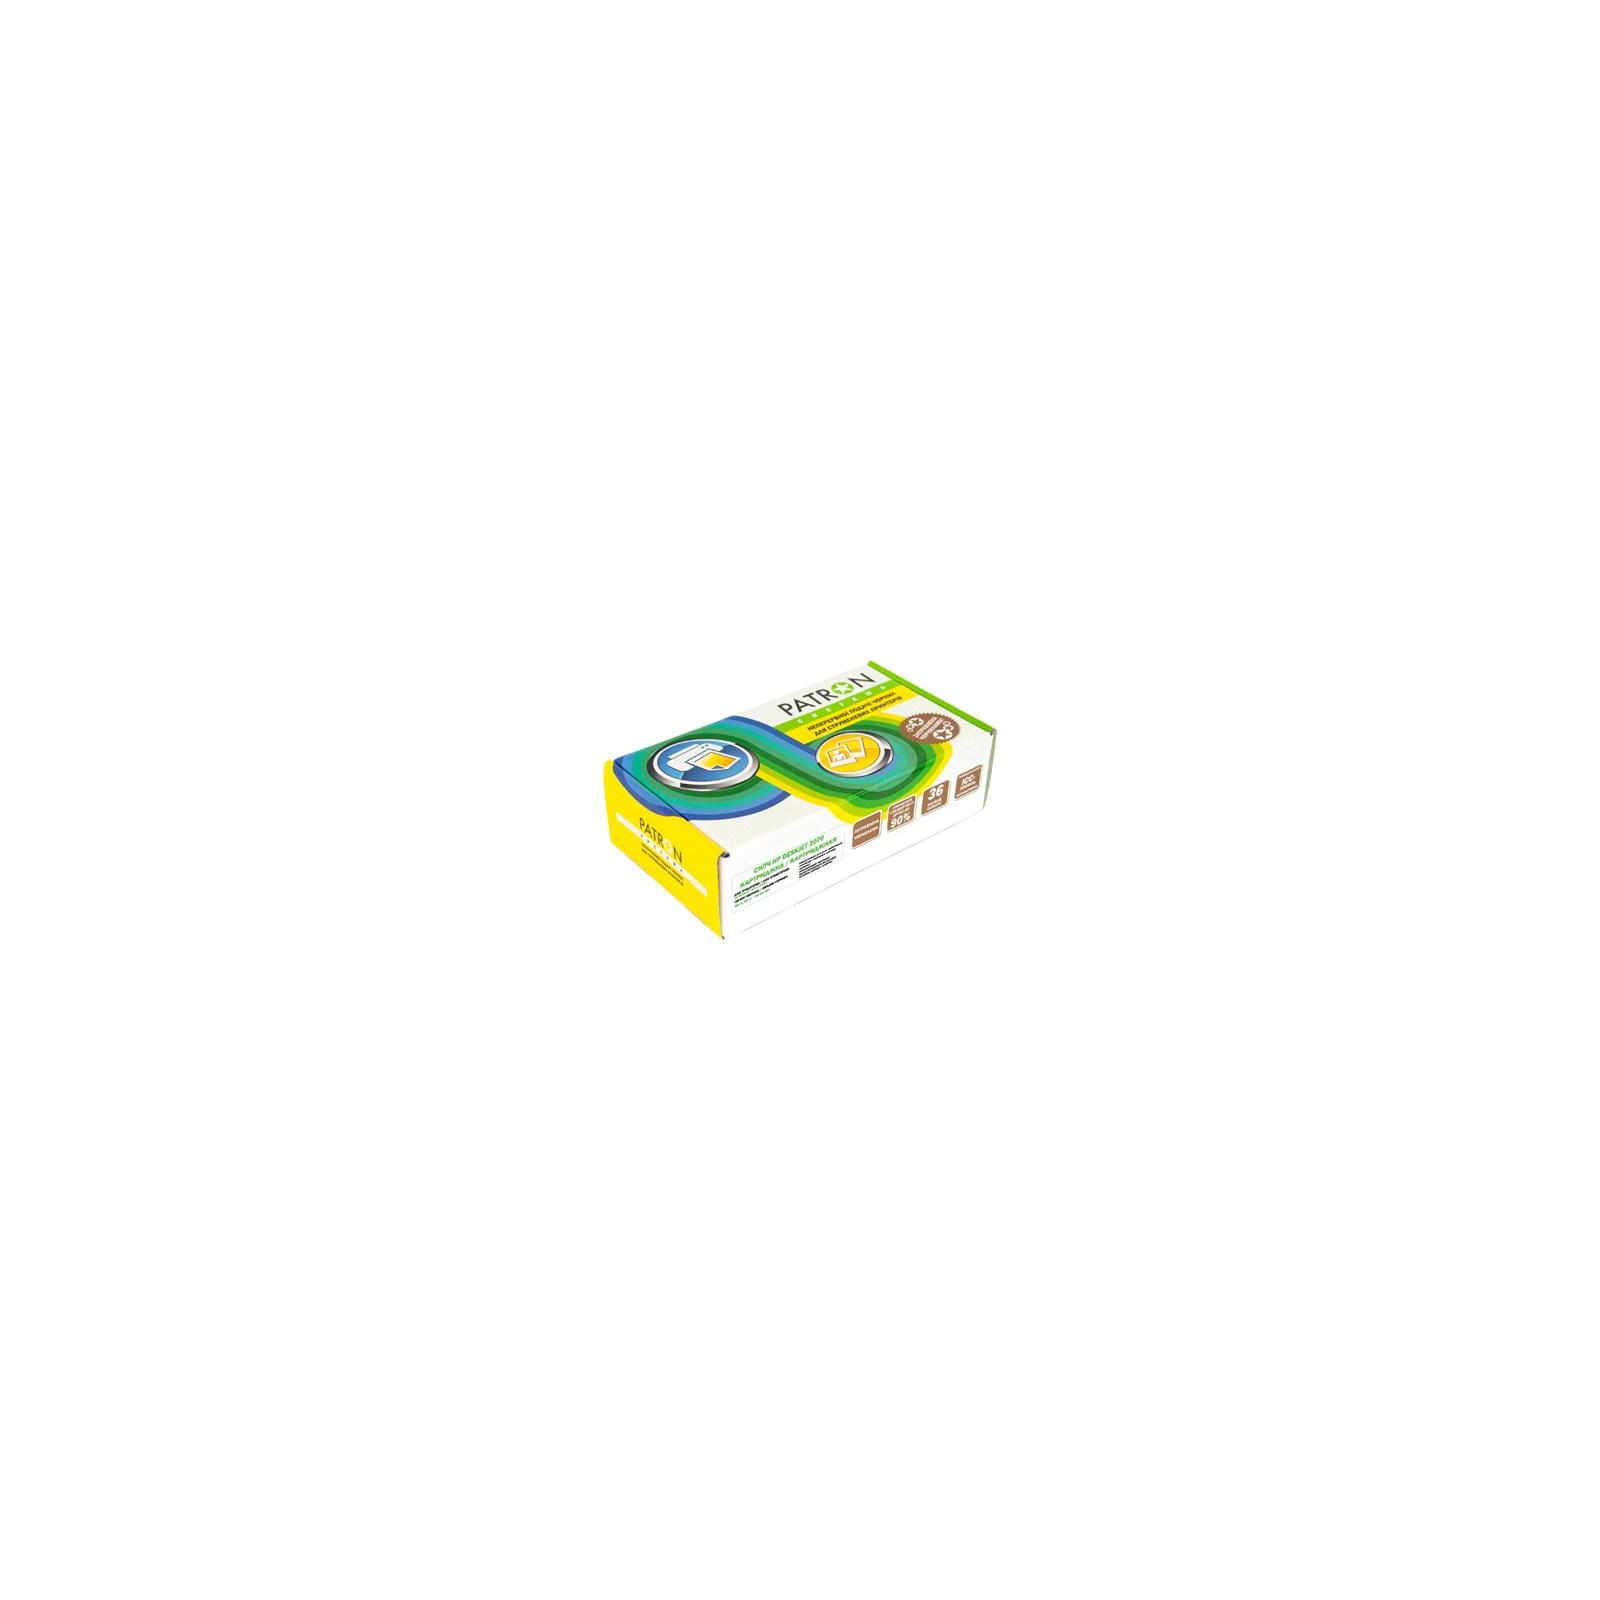 СНПЧ PATRON HP DJ 3070/3070A (CISS-PN-C-HP-3070)